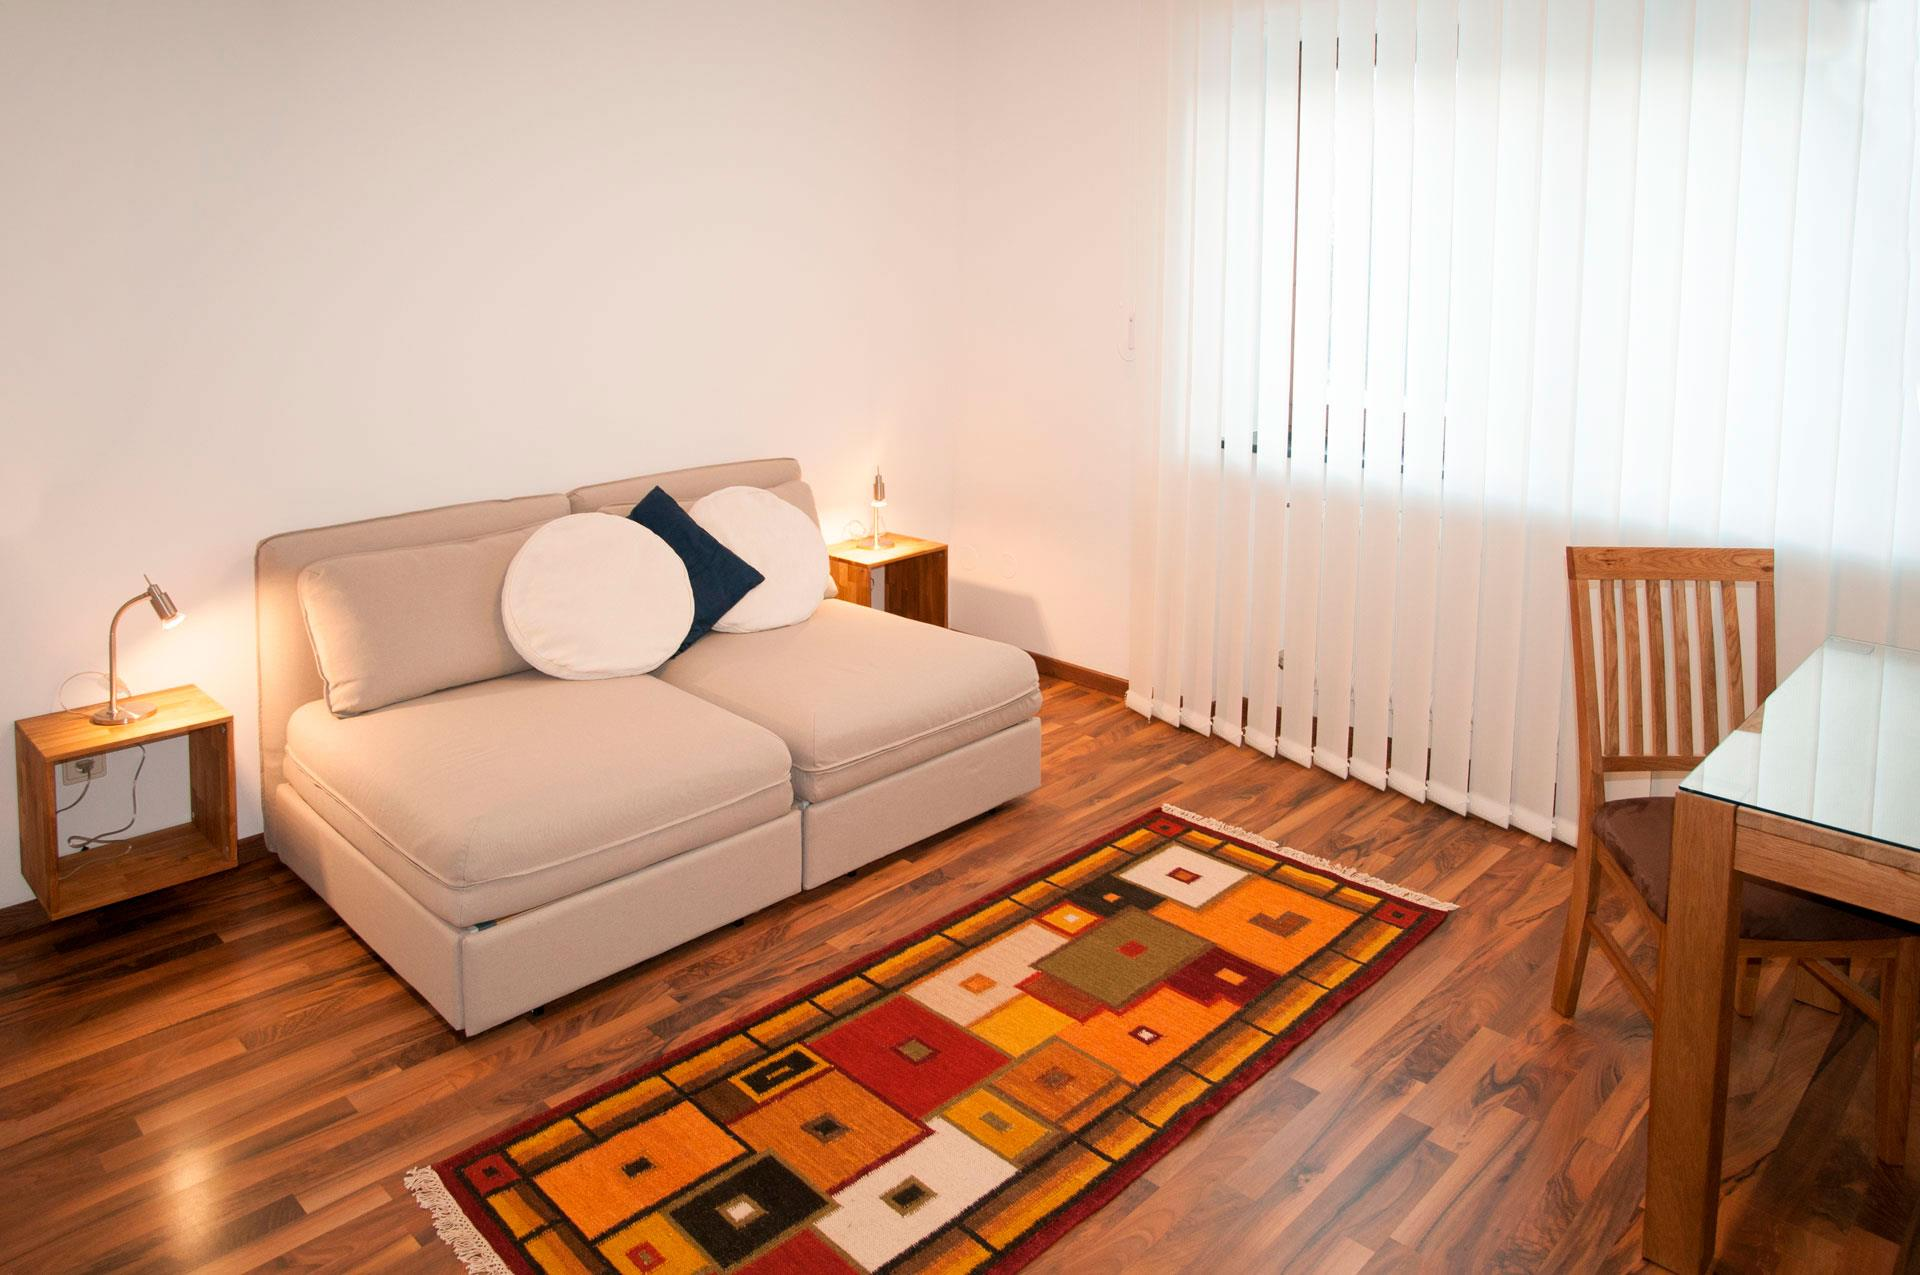 Apartment Kraus, Sterzing, Südtirol, Wohnraum